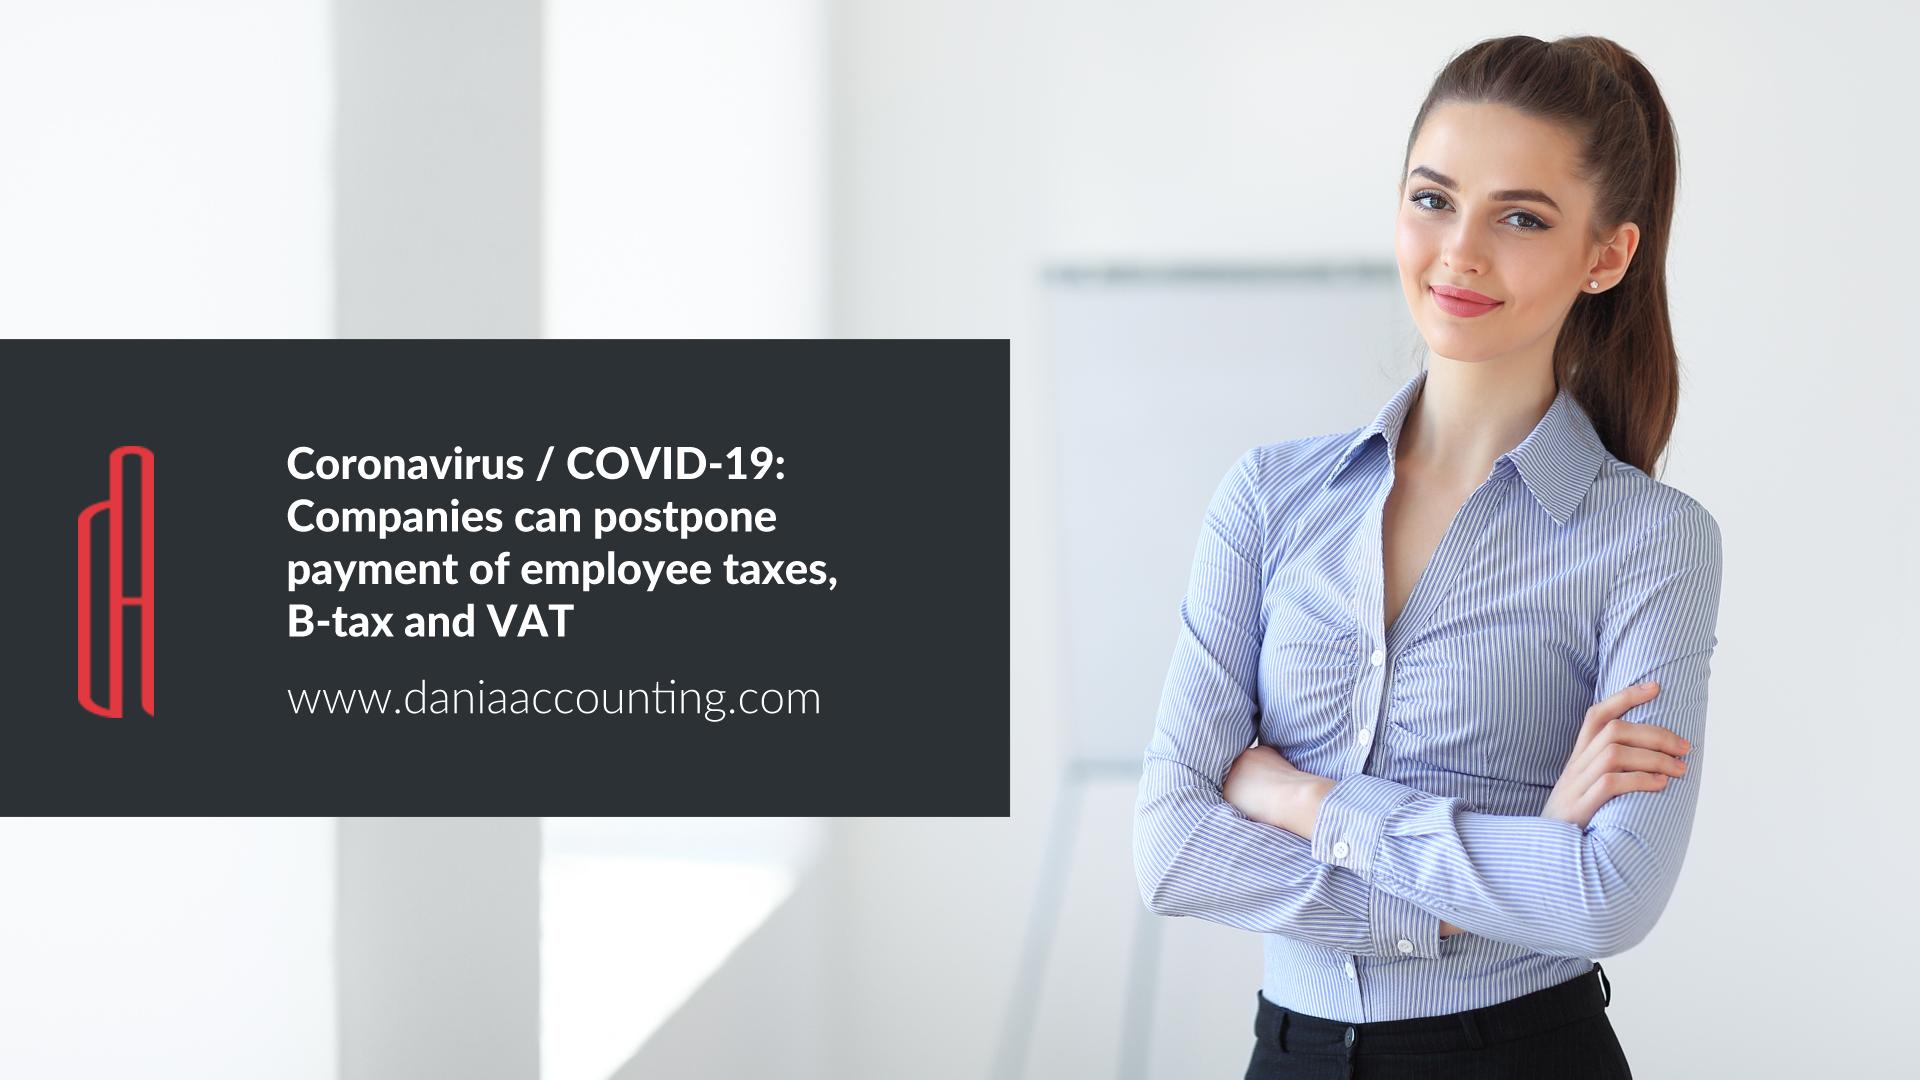 Coronavirus/COVID-19: Small companies can postpone payment of employee taxes, B-tax (sole proprietors) and VAT